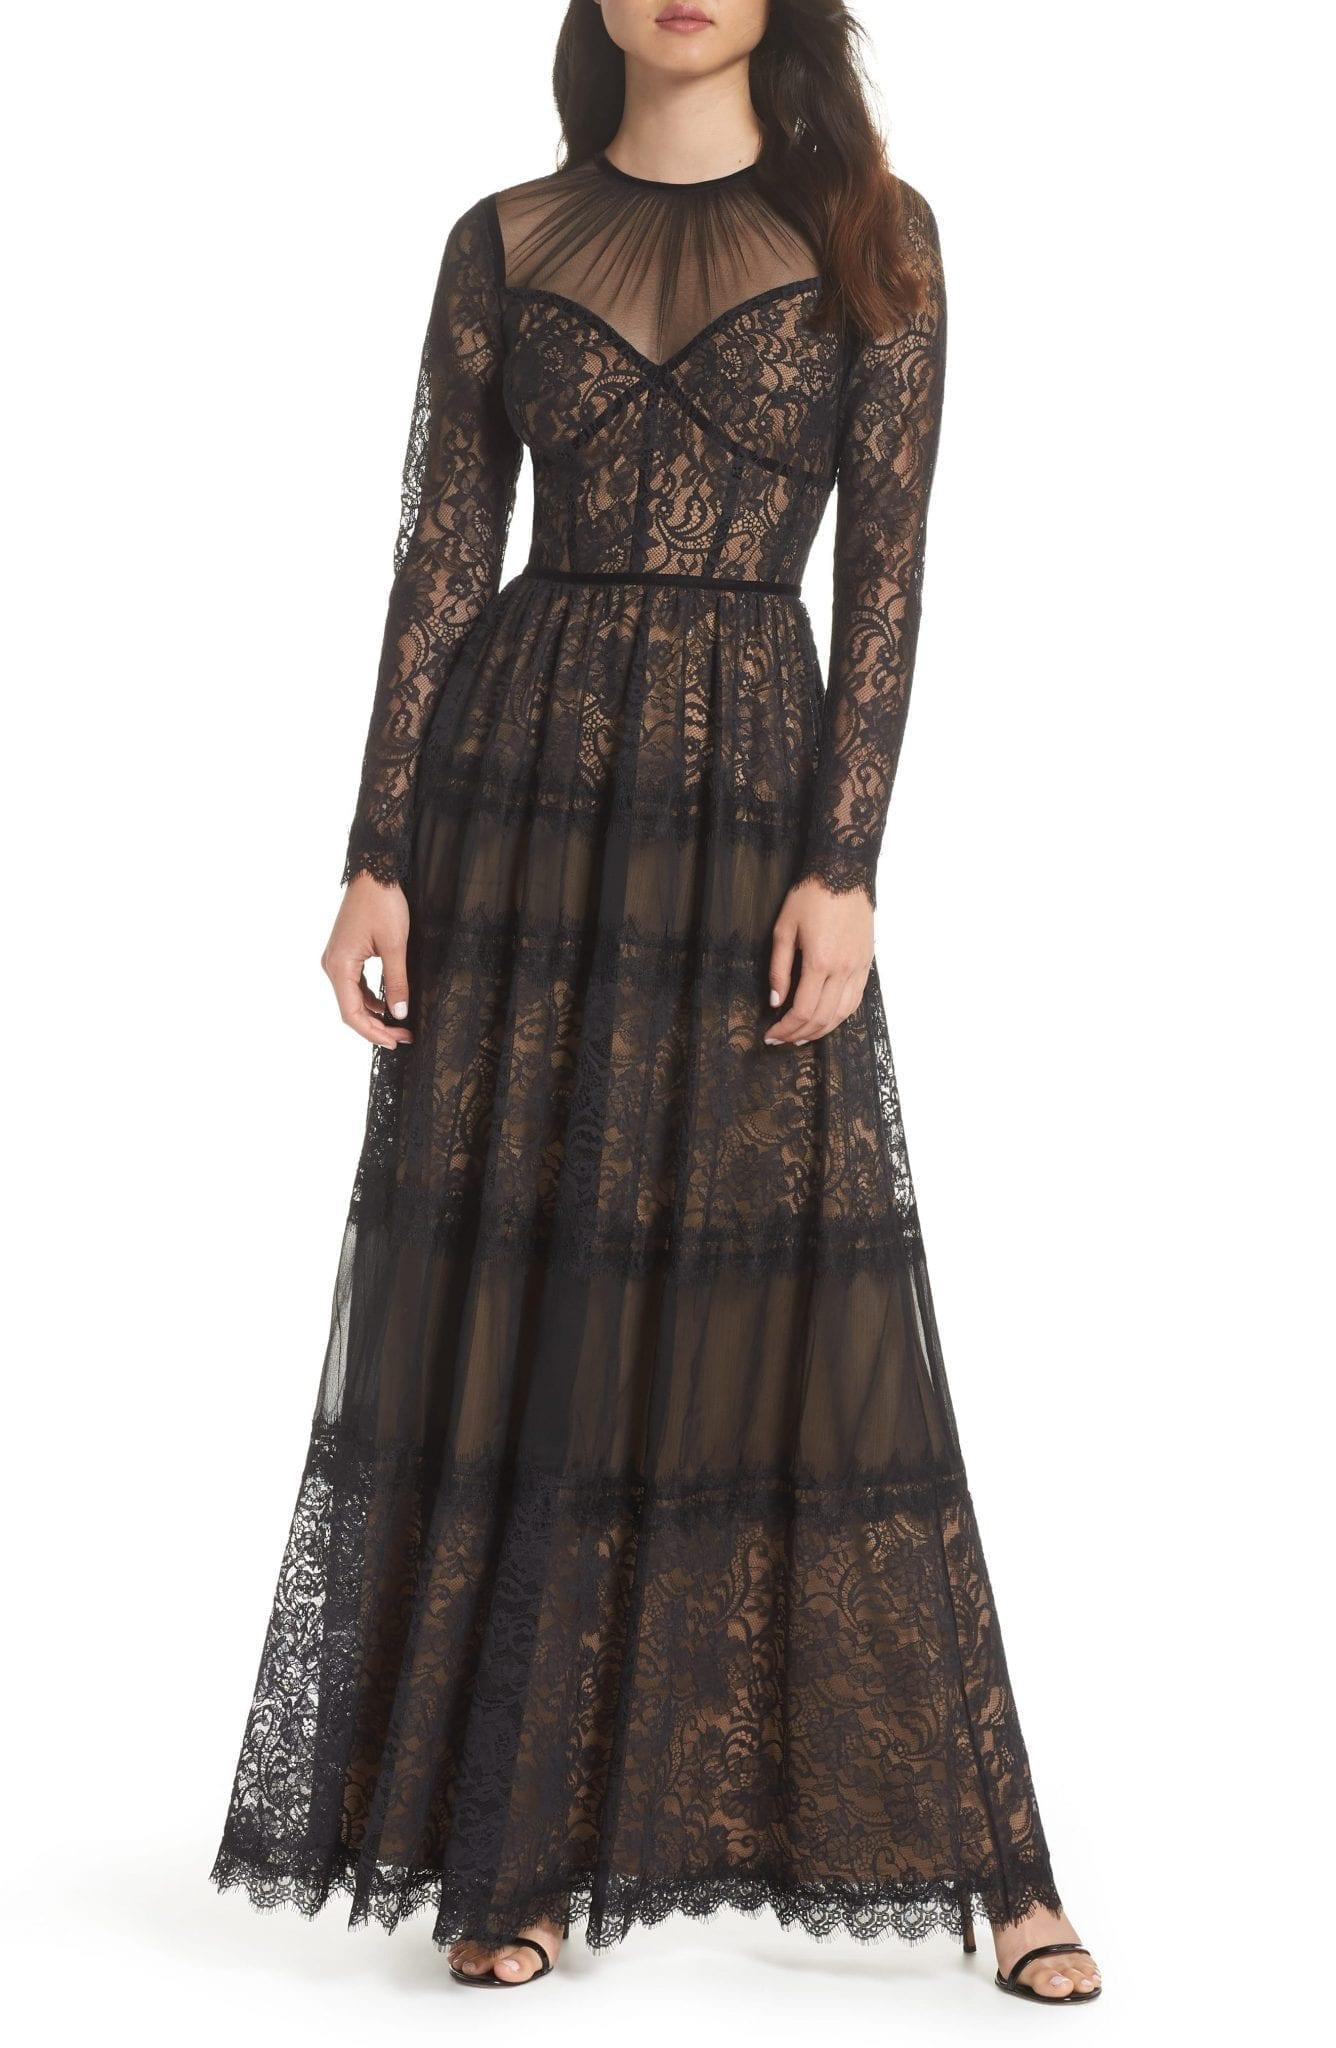 TADASHI SHOJI Lace Black / Nude Gown - We Select Dresses